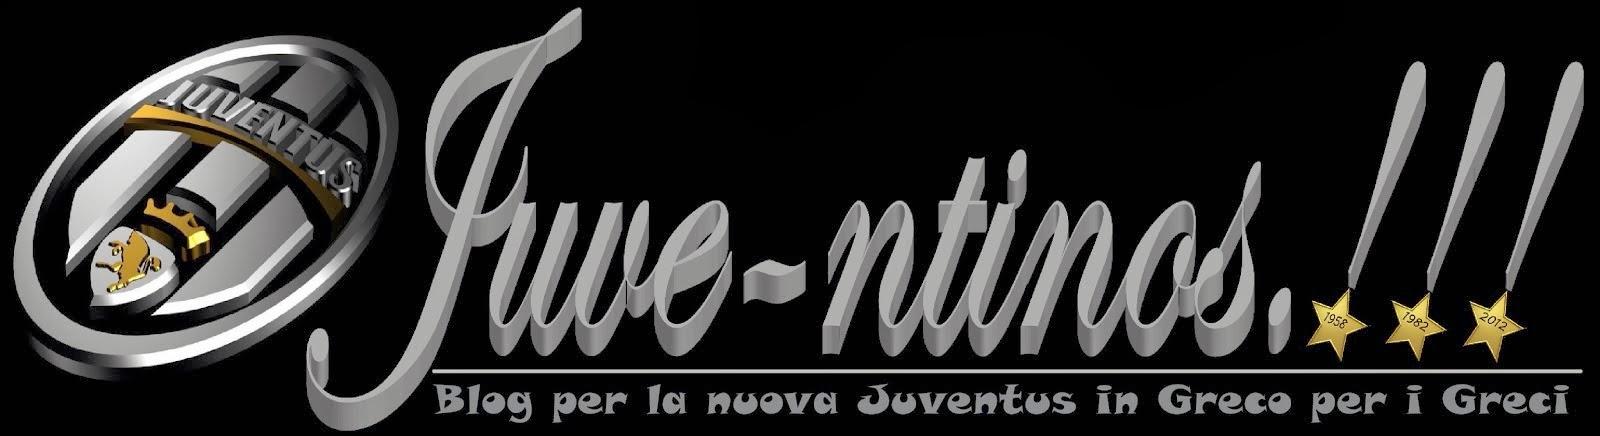 O Juve-ntinos!!! στο Facebook.